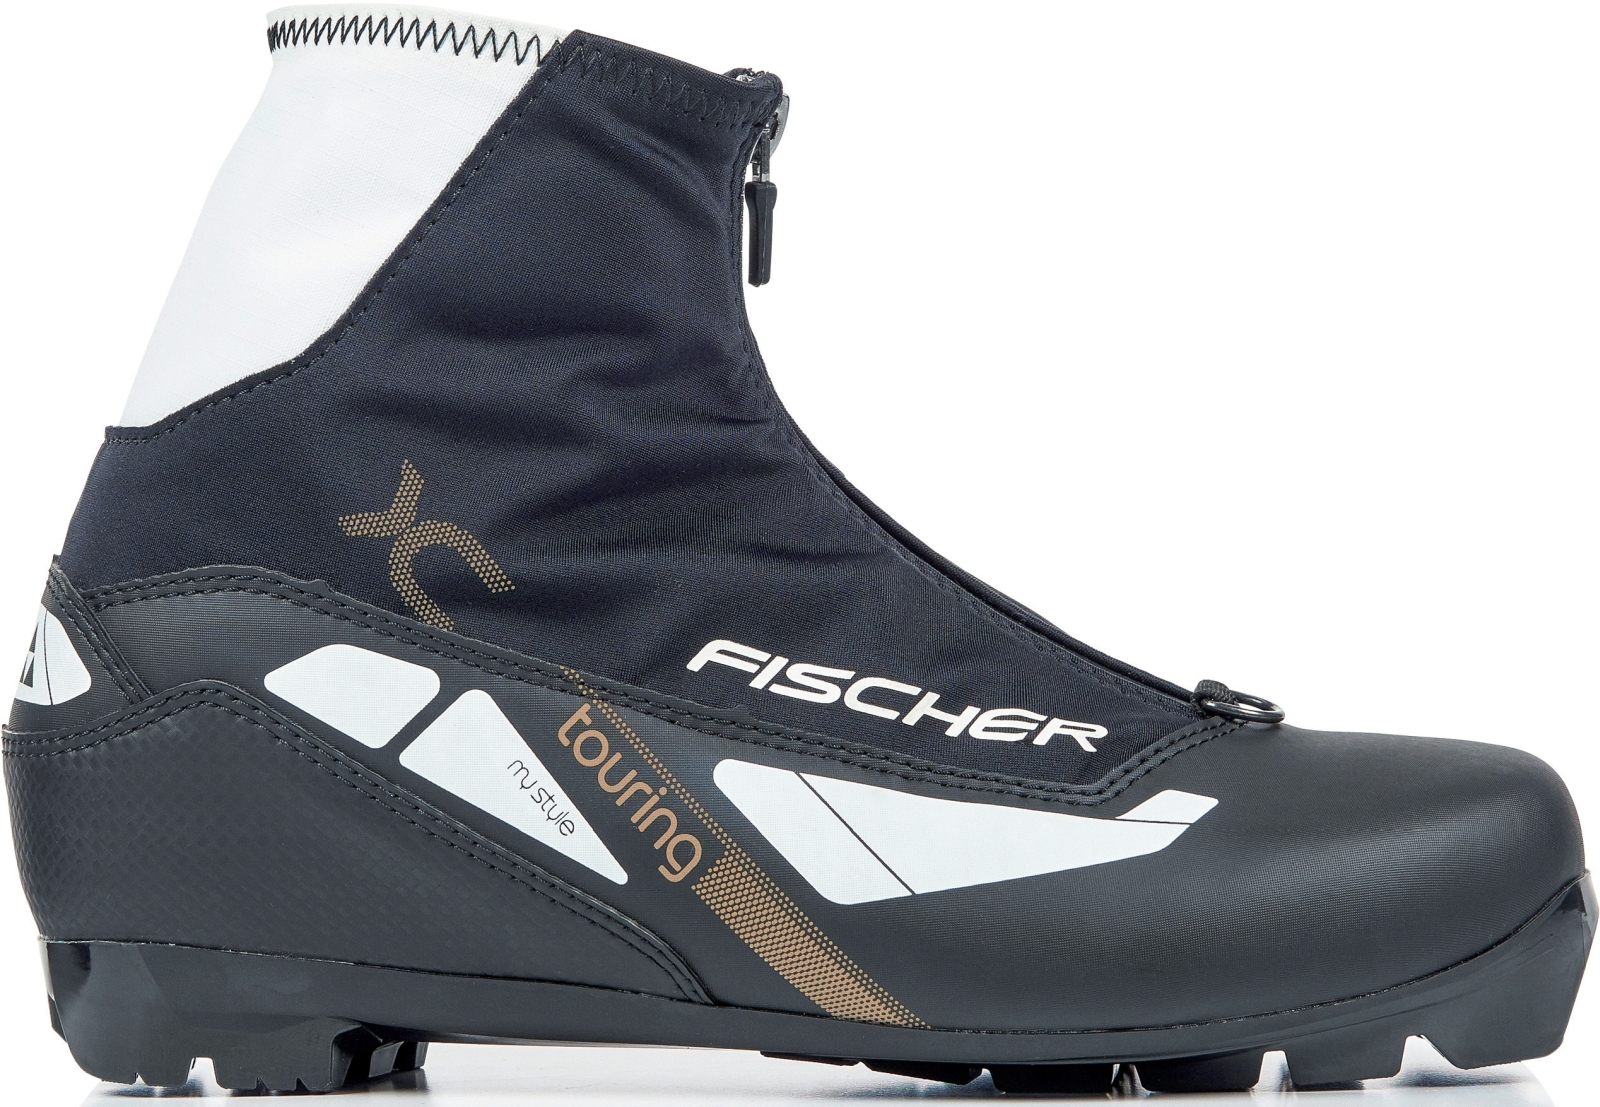 Fischer XC Touring My Style 42